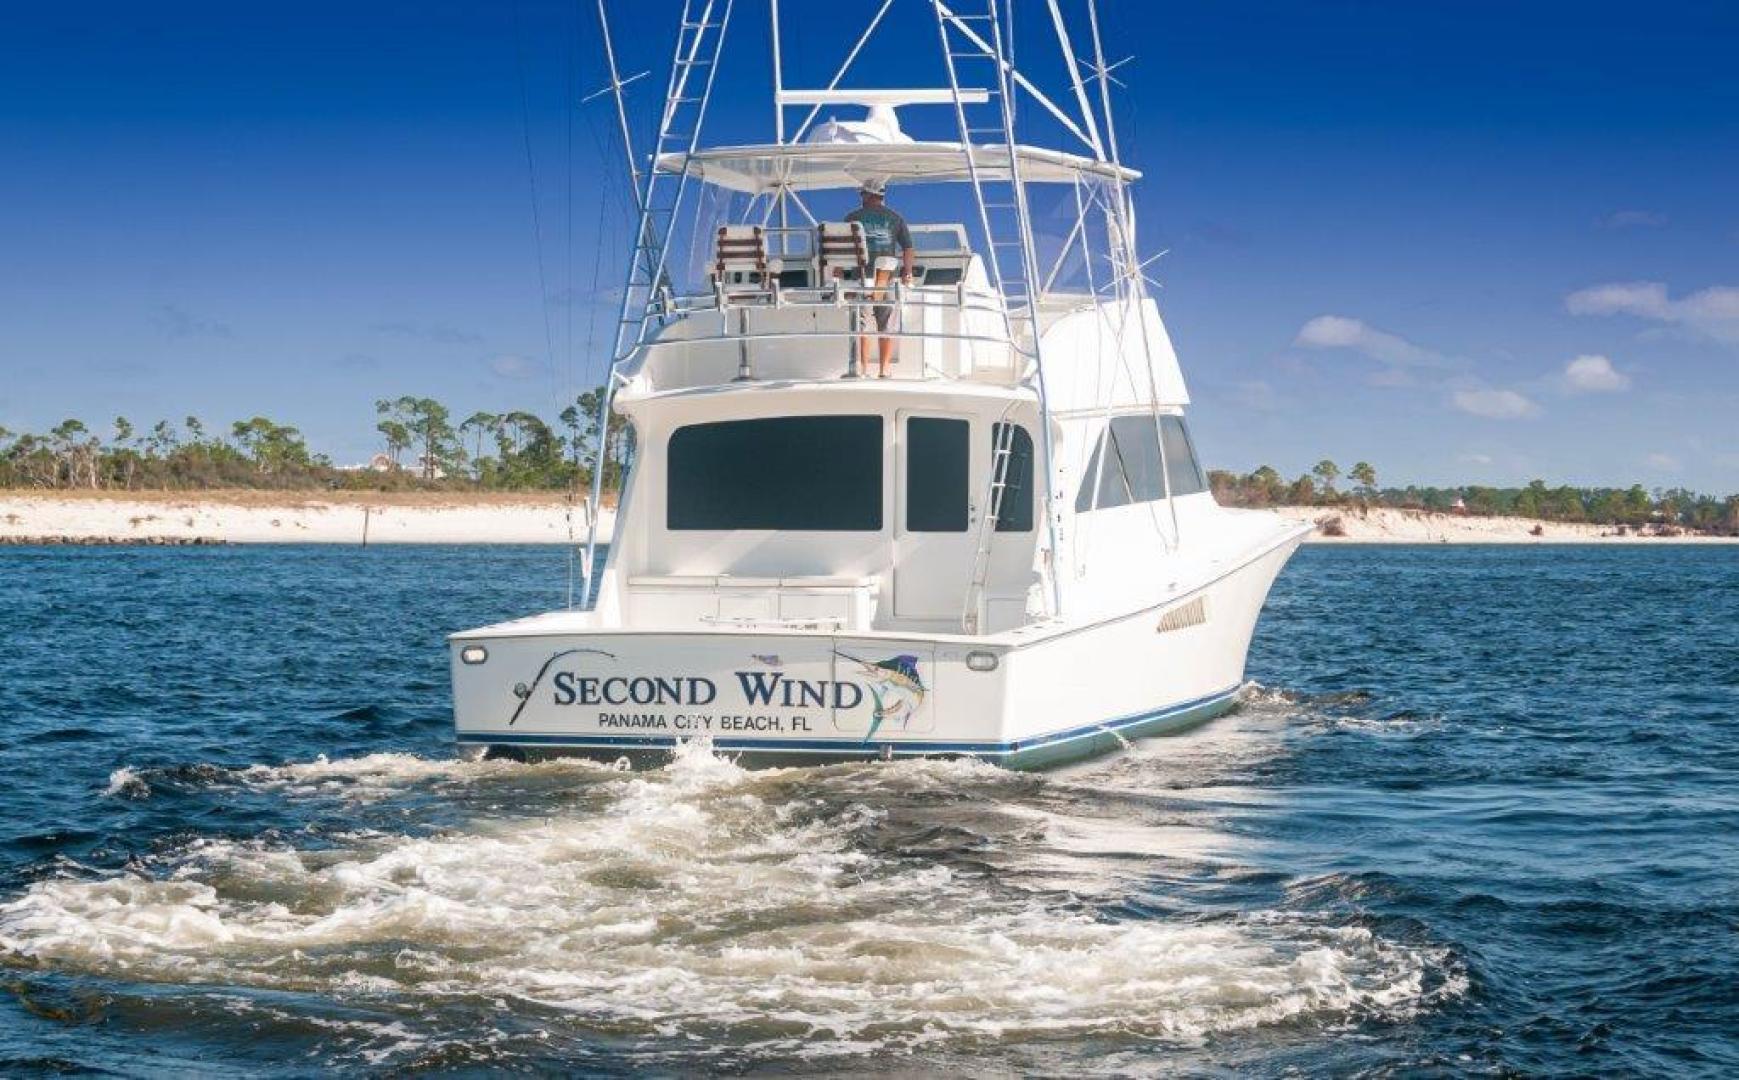 Viking-61 Convertible 2004-Second Wind Panama City Beach-Florida-United States-2004 61 Viking Convertible Second Wind Transom (2)-1545122 | Thumbnail